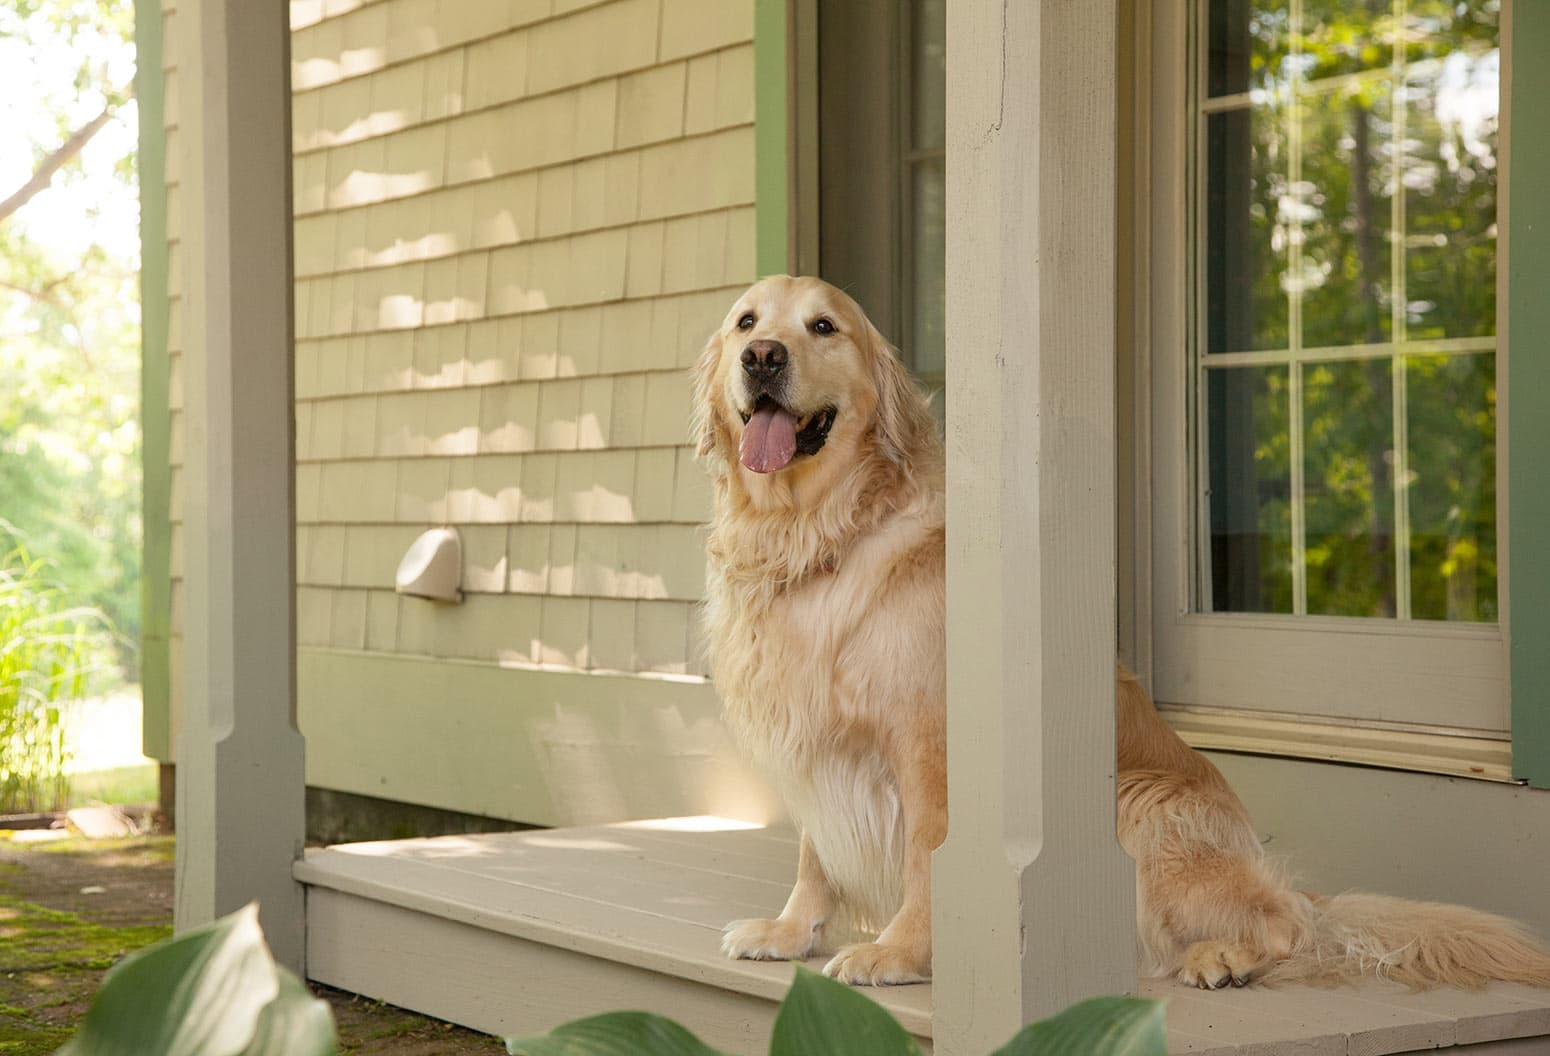 Happy dog on a porch at Pet Friendly B&B